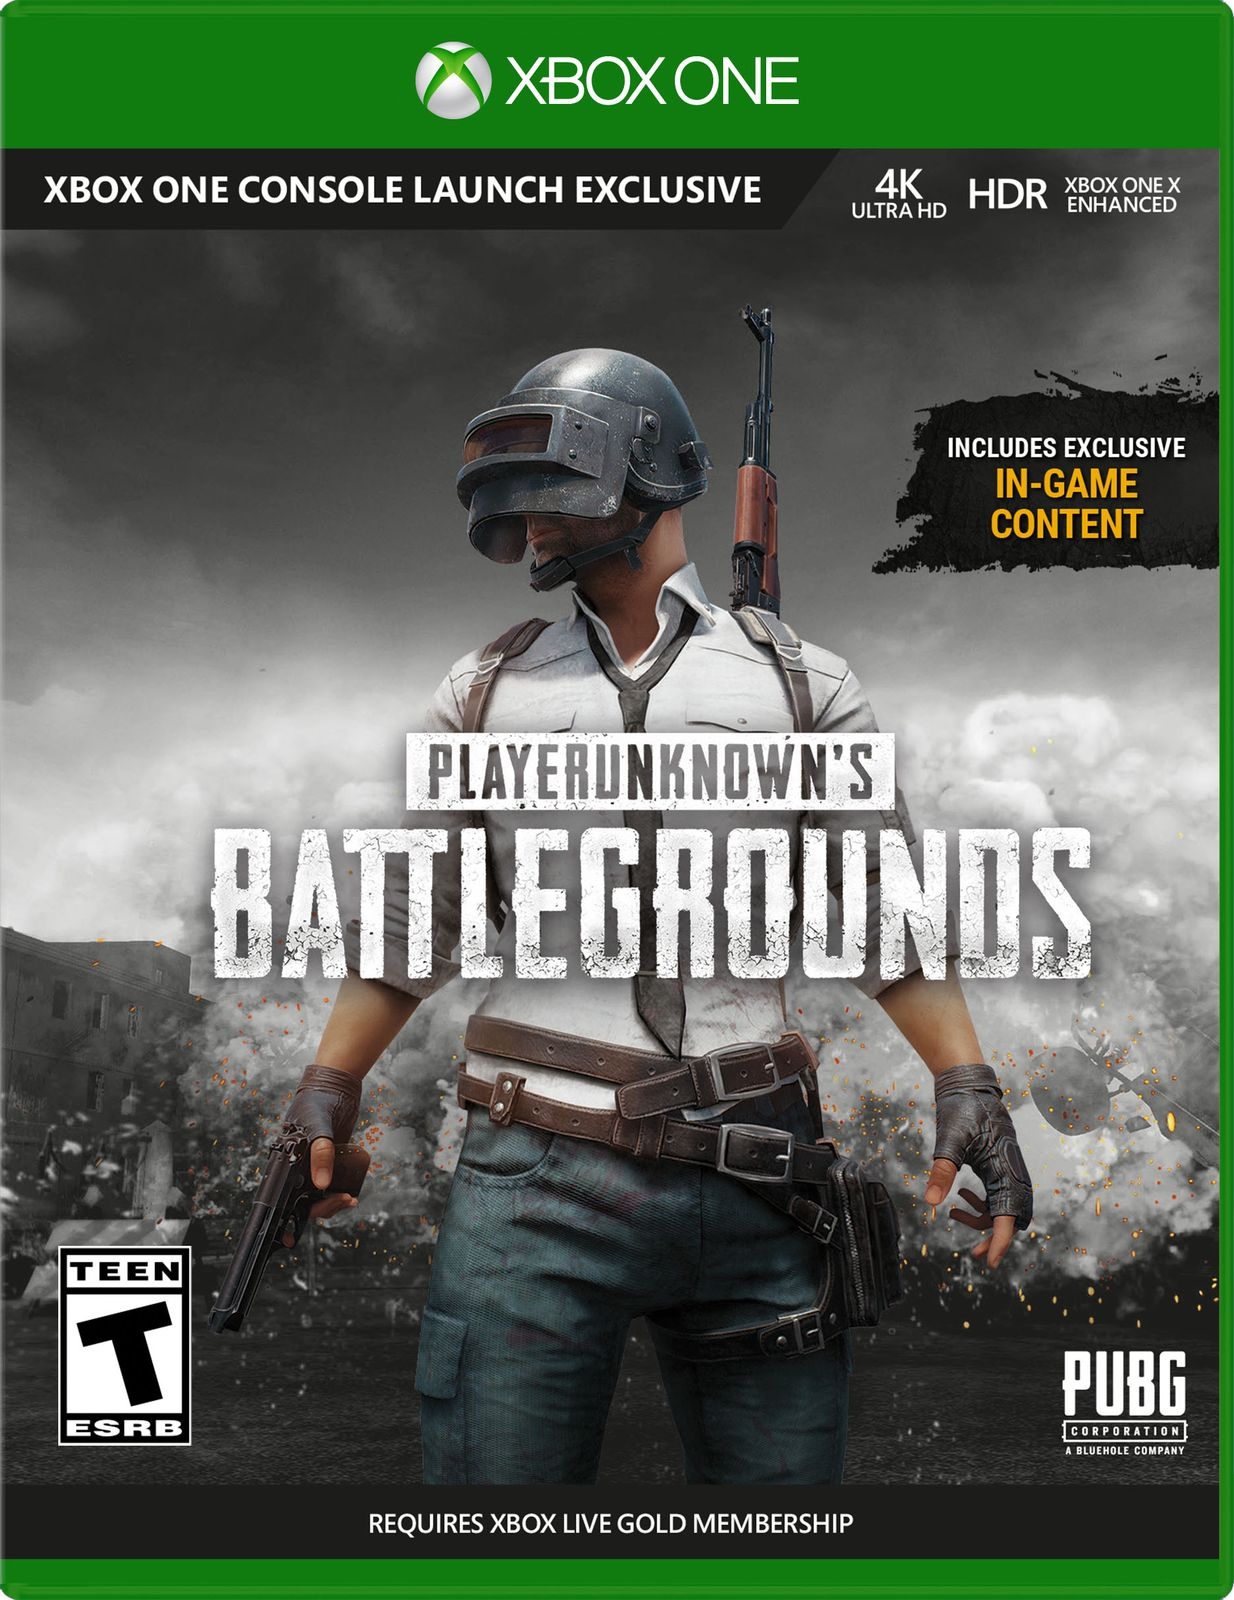 PlayerUnknown's Battlegrounds (Xbox One) игровая консоль microsoft xbox one s 1 тб [234 00311] игра playerunknown s battlegrounds